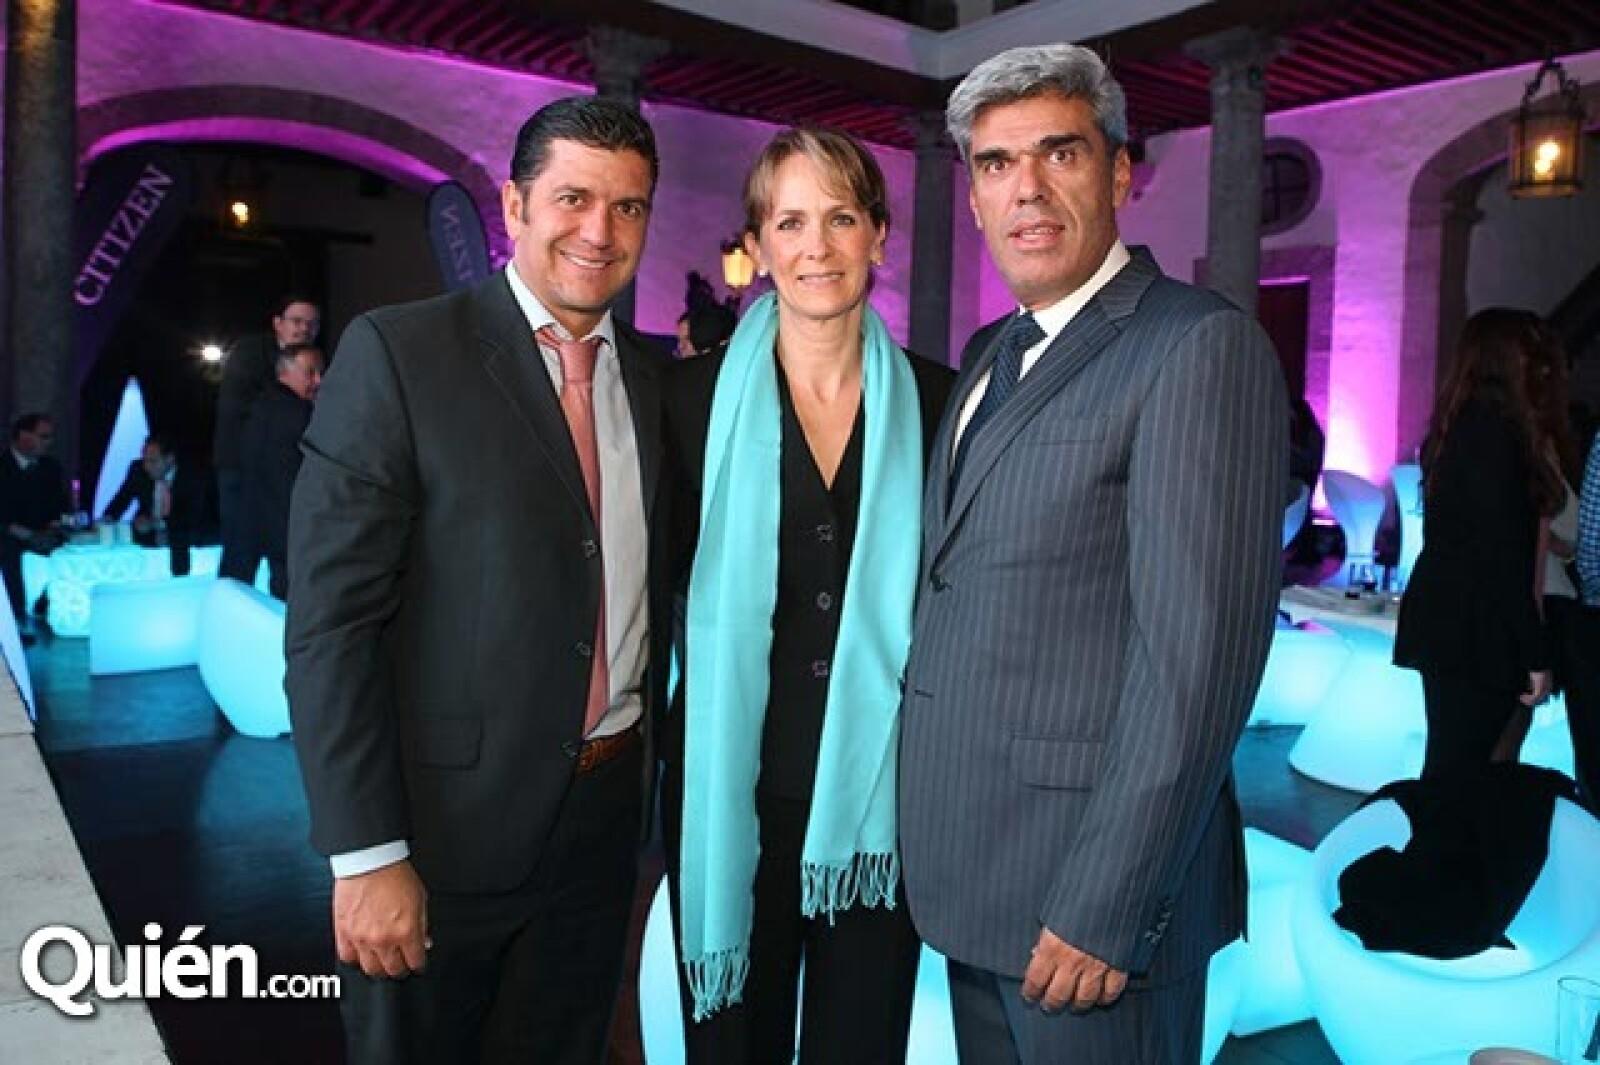 Juan Carlos Martínez, Alexandra Solana y Mauricio González